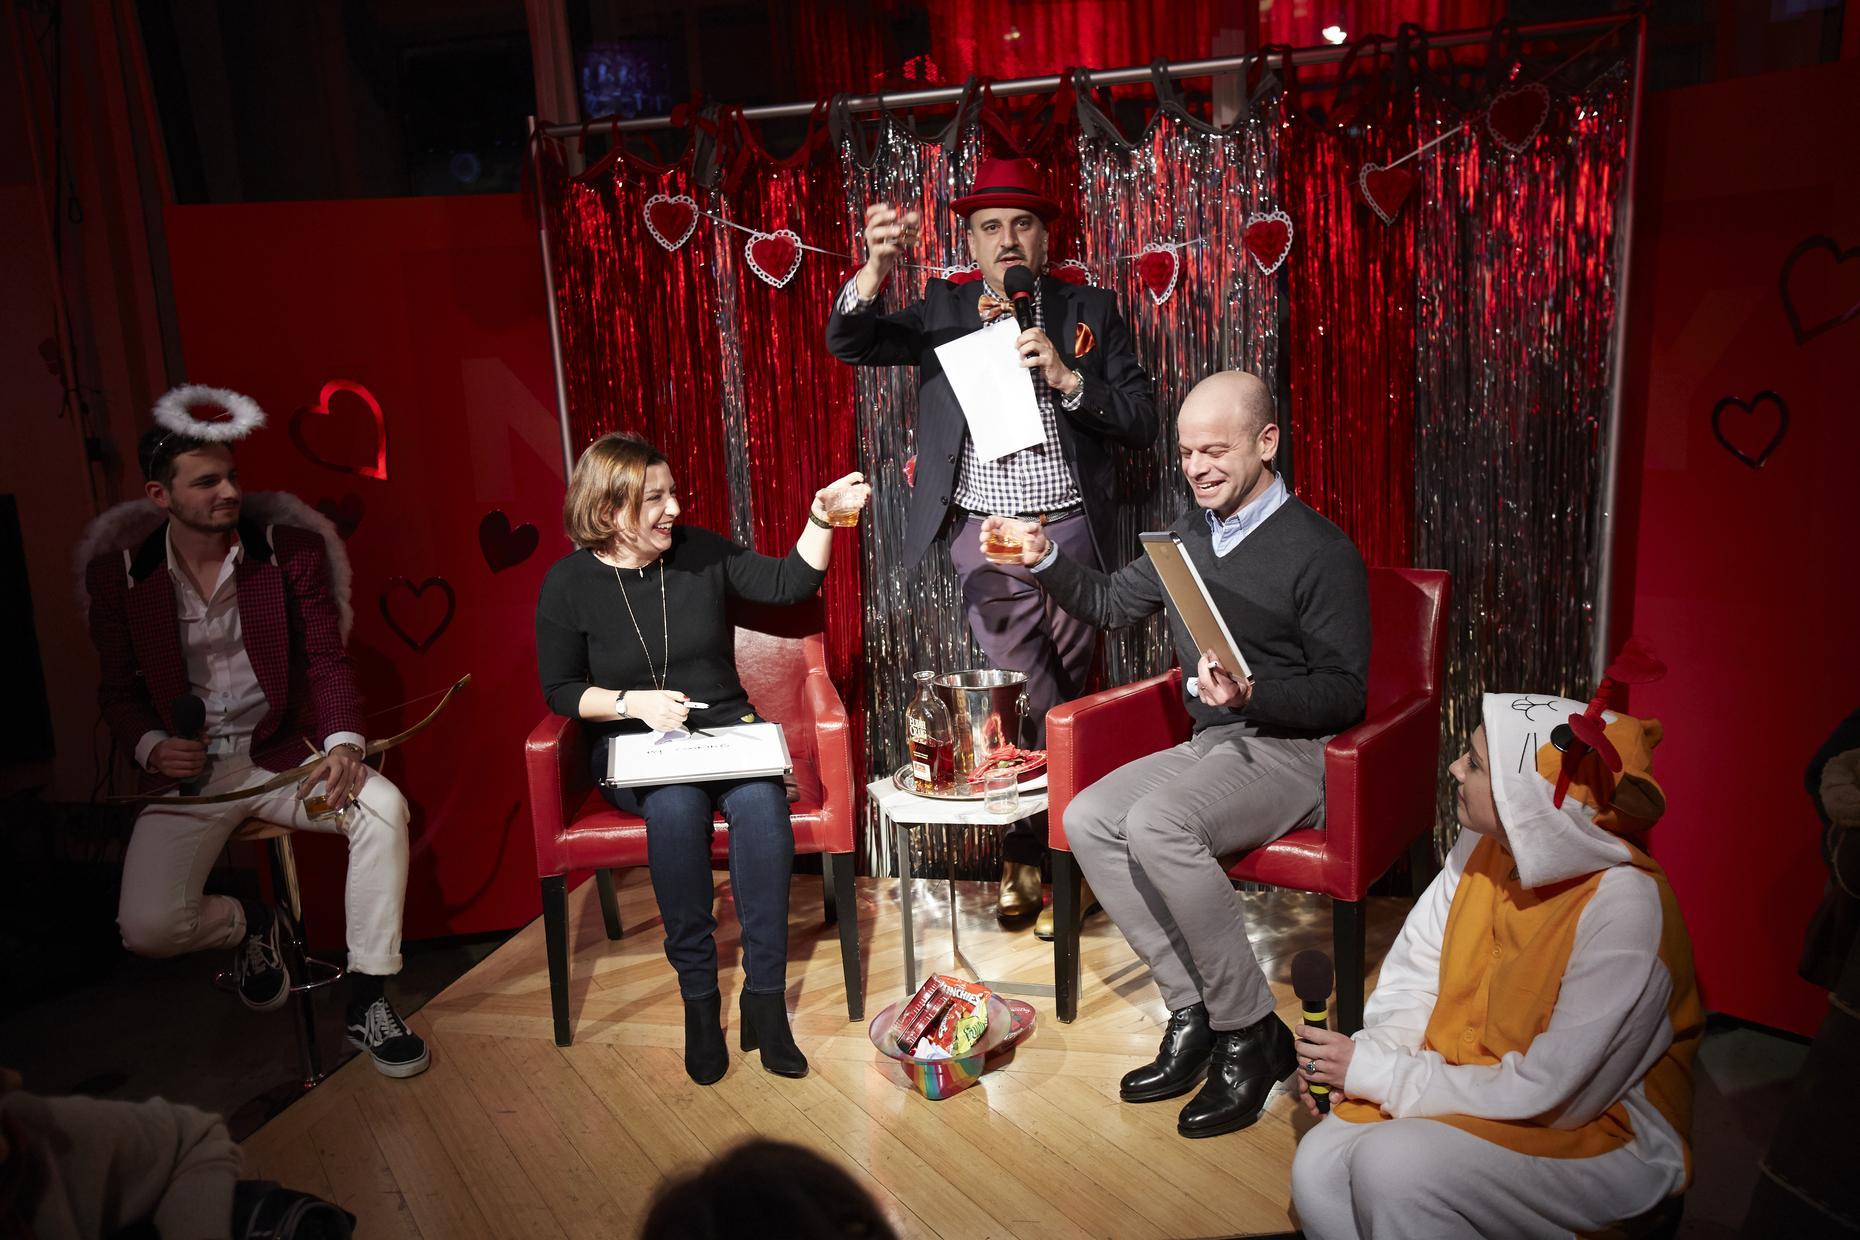 44 Charlton, Season 3 Premiere: Nellie McKay, LubDub Theatre, Witness Relocation